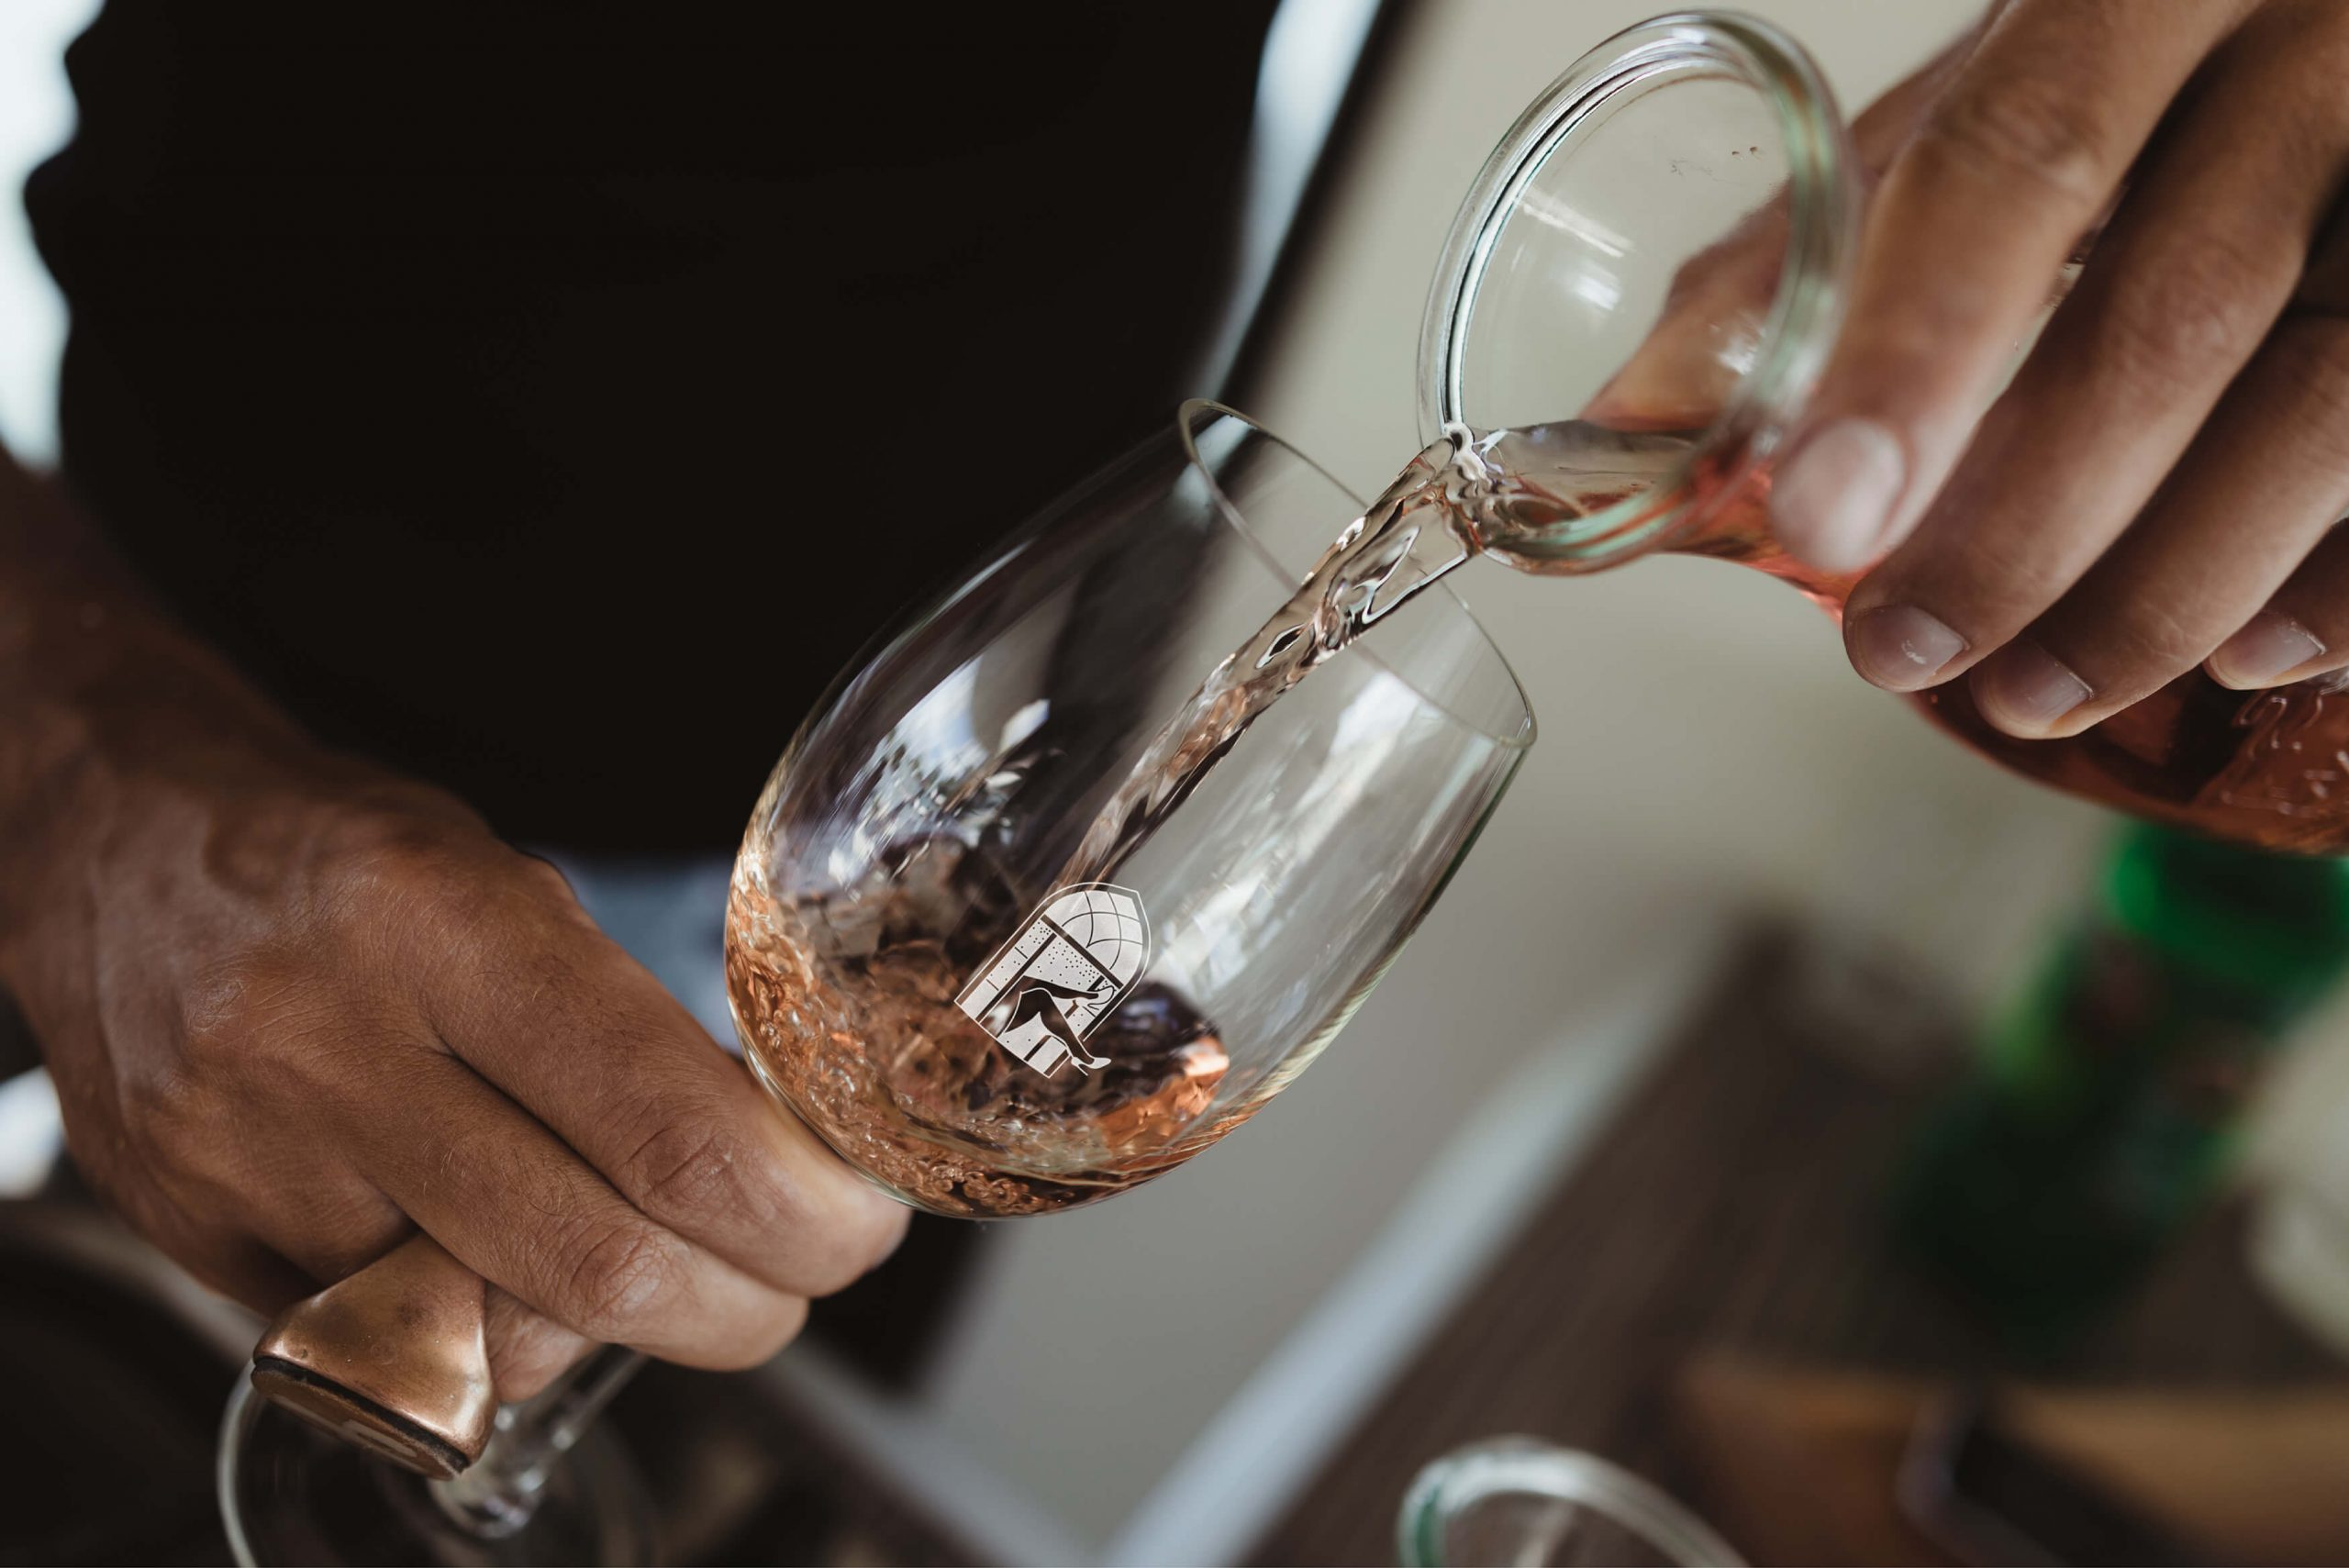 Ovolo Za Za Ta Hospitality Visual Identity - Brand wine glass being poured